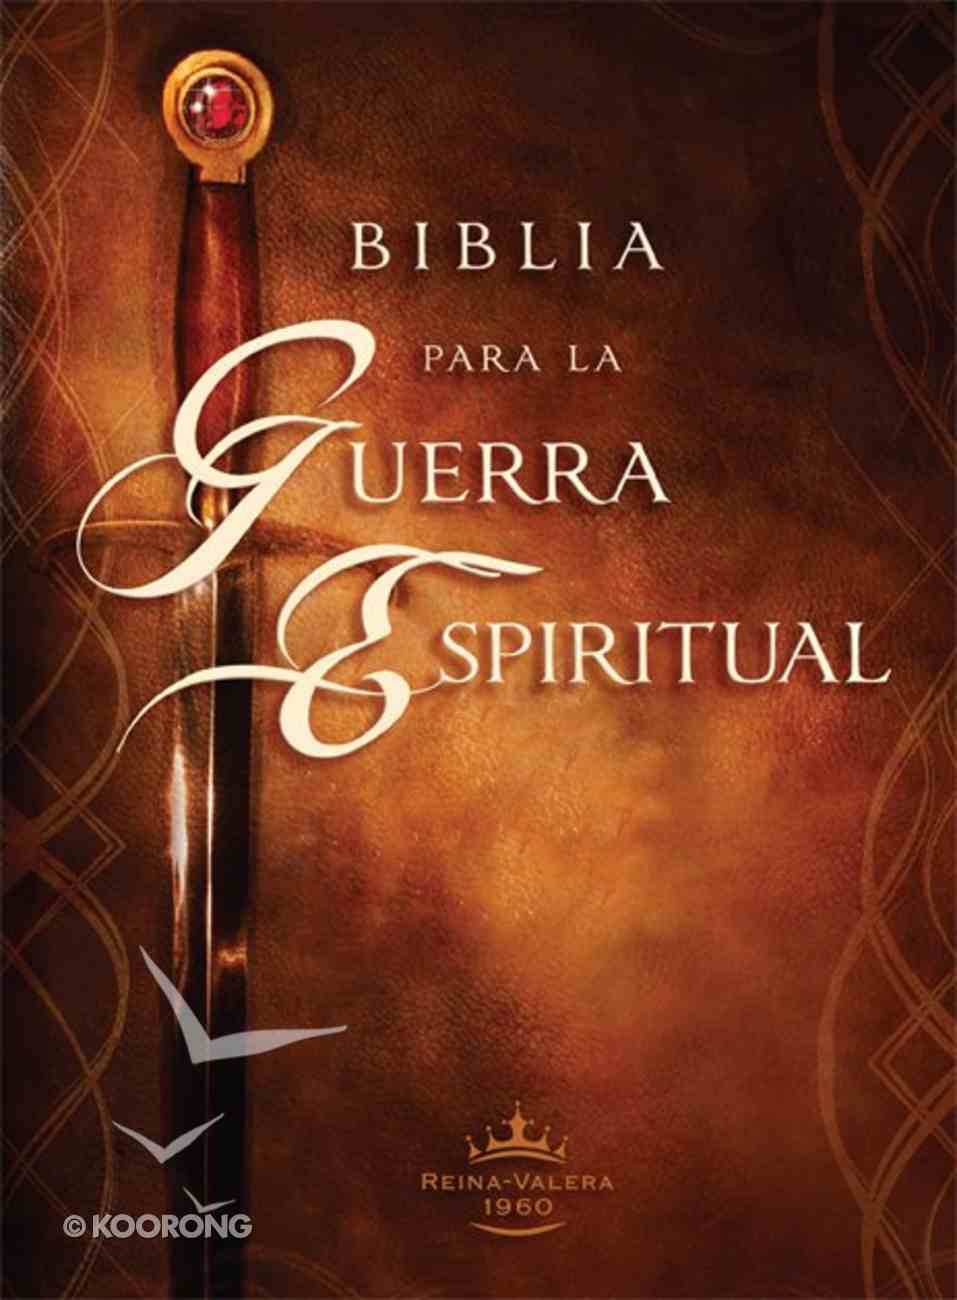 Biblia Para La Guerra Espiritual (Spiritual Warfare Bible) Hardback